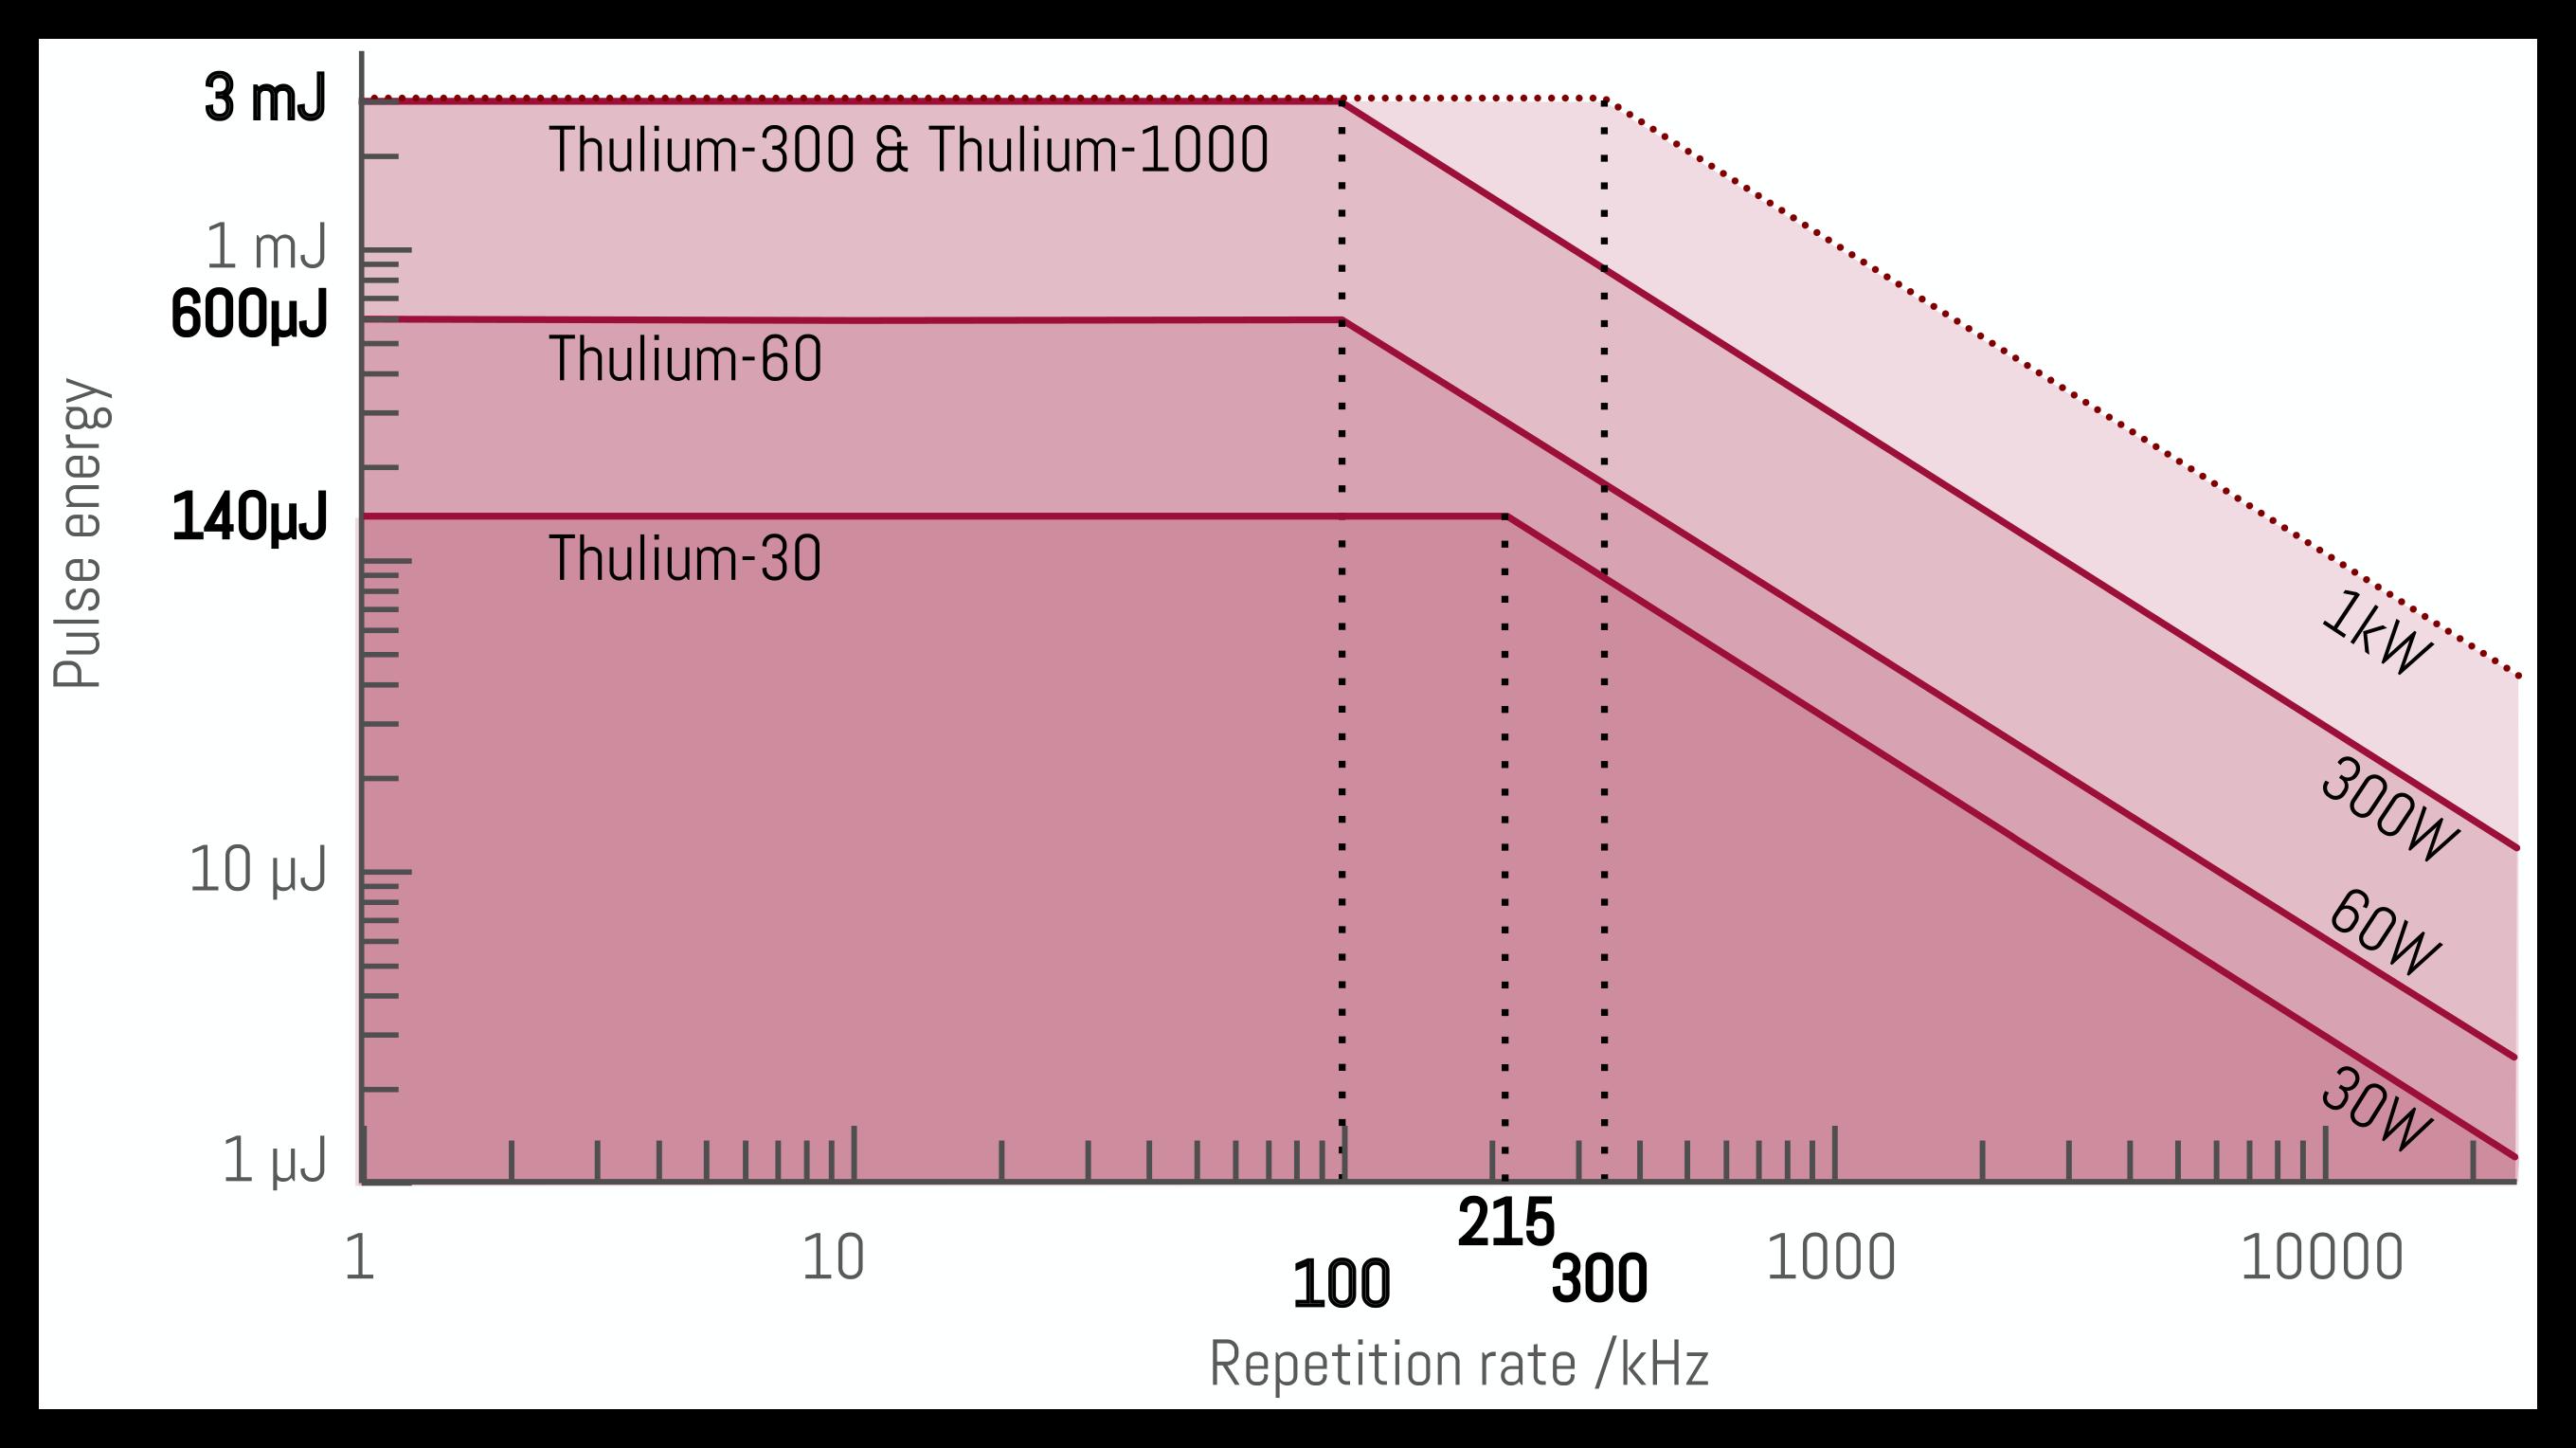 Laser types Thulium-30-1000